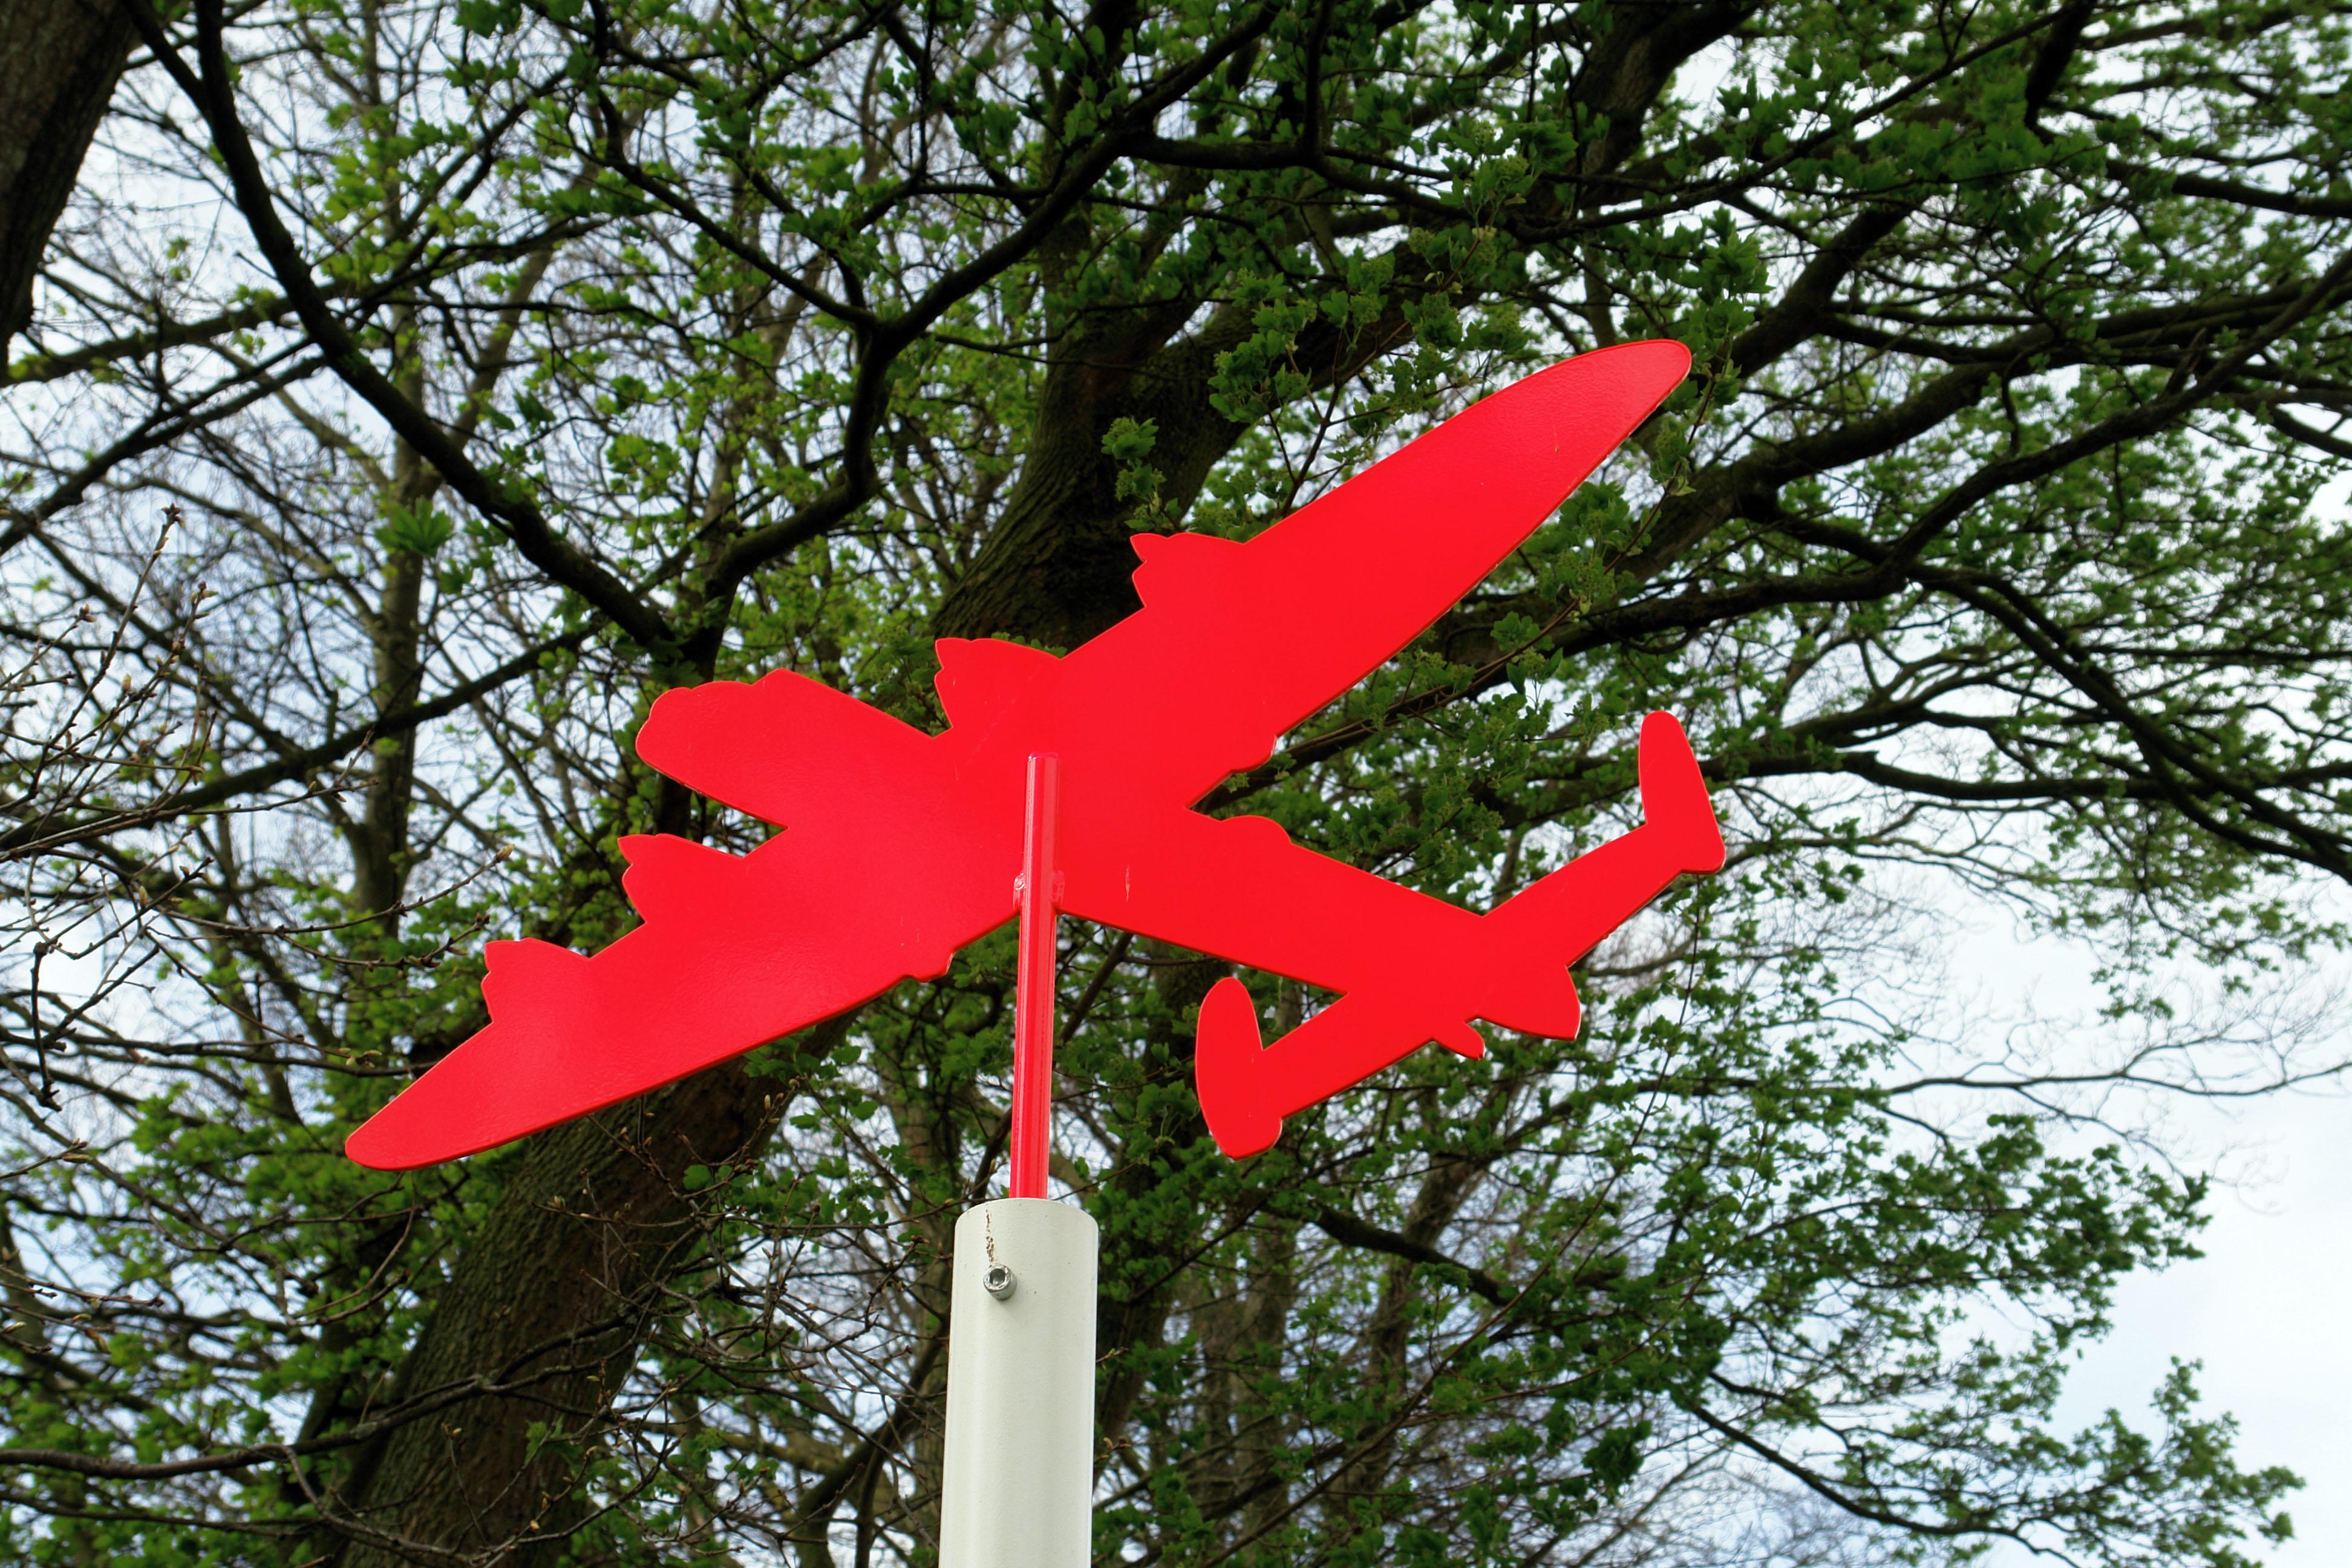 Lezing over crashes van vliegtuigen